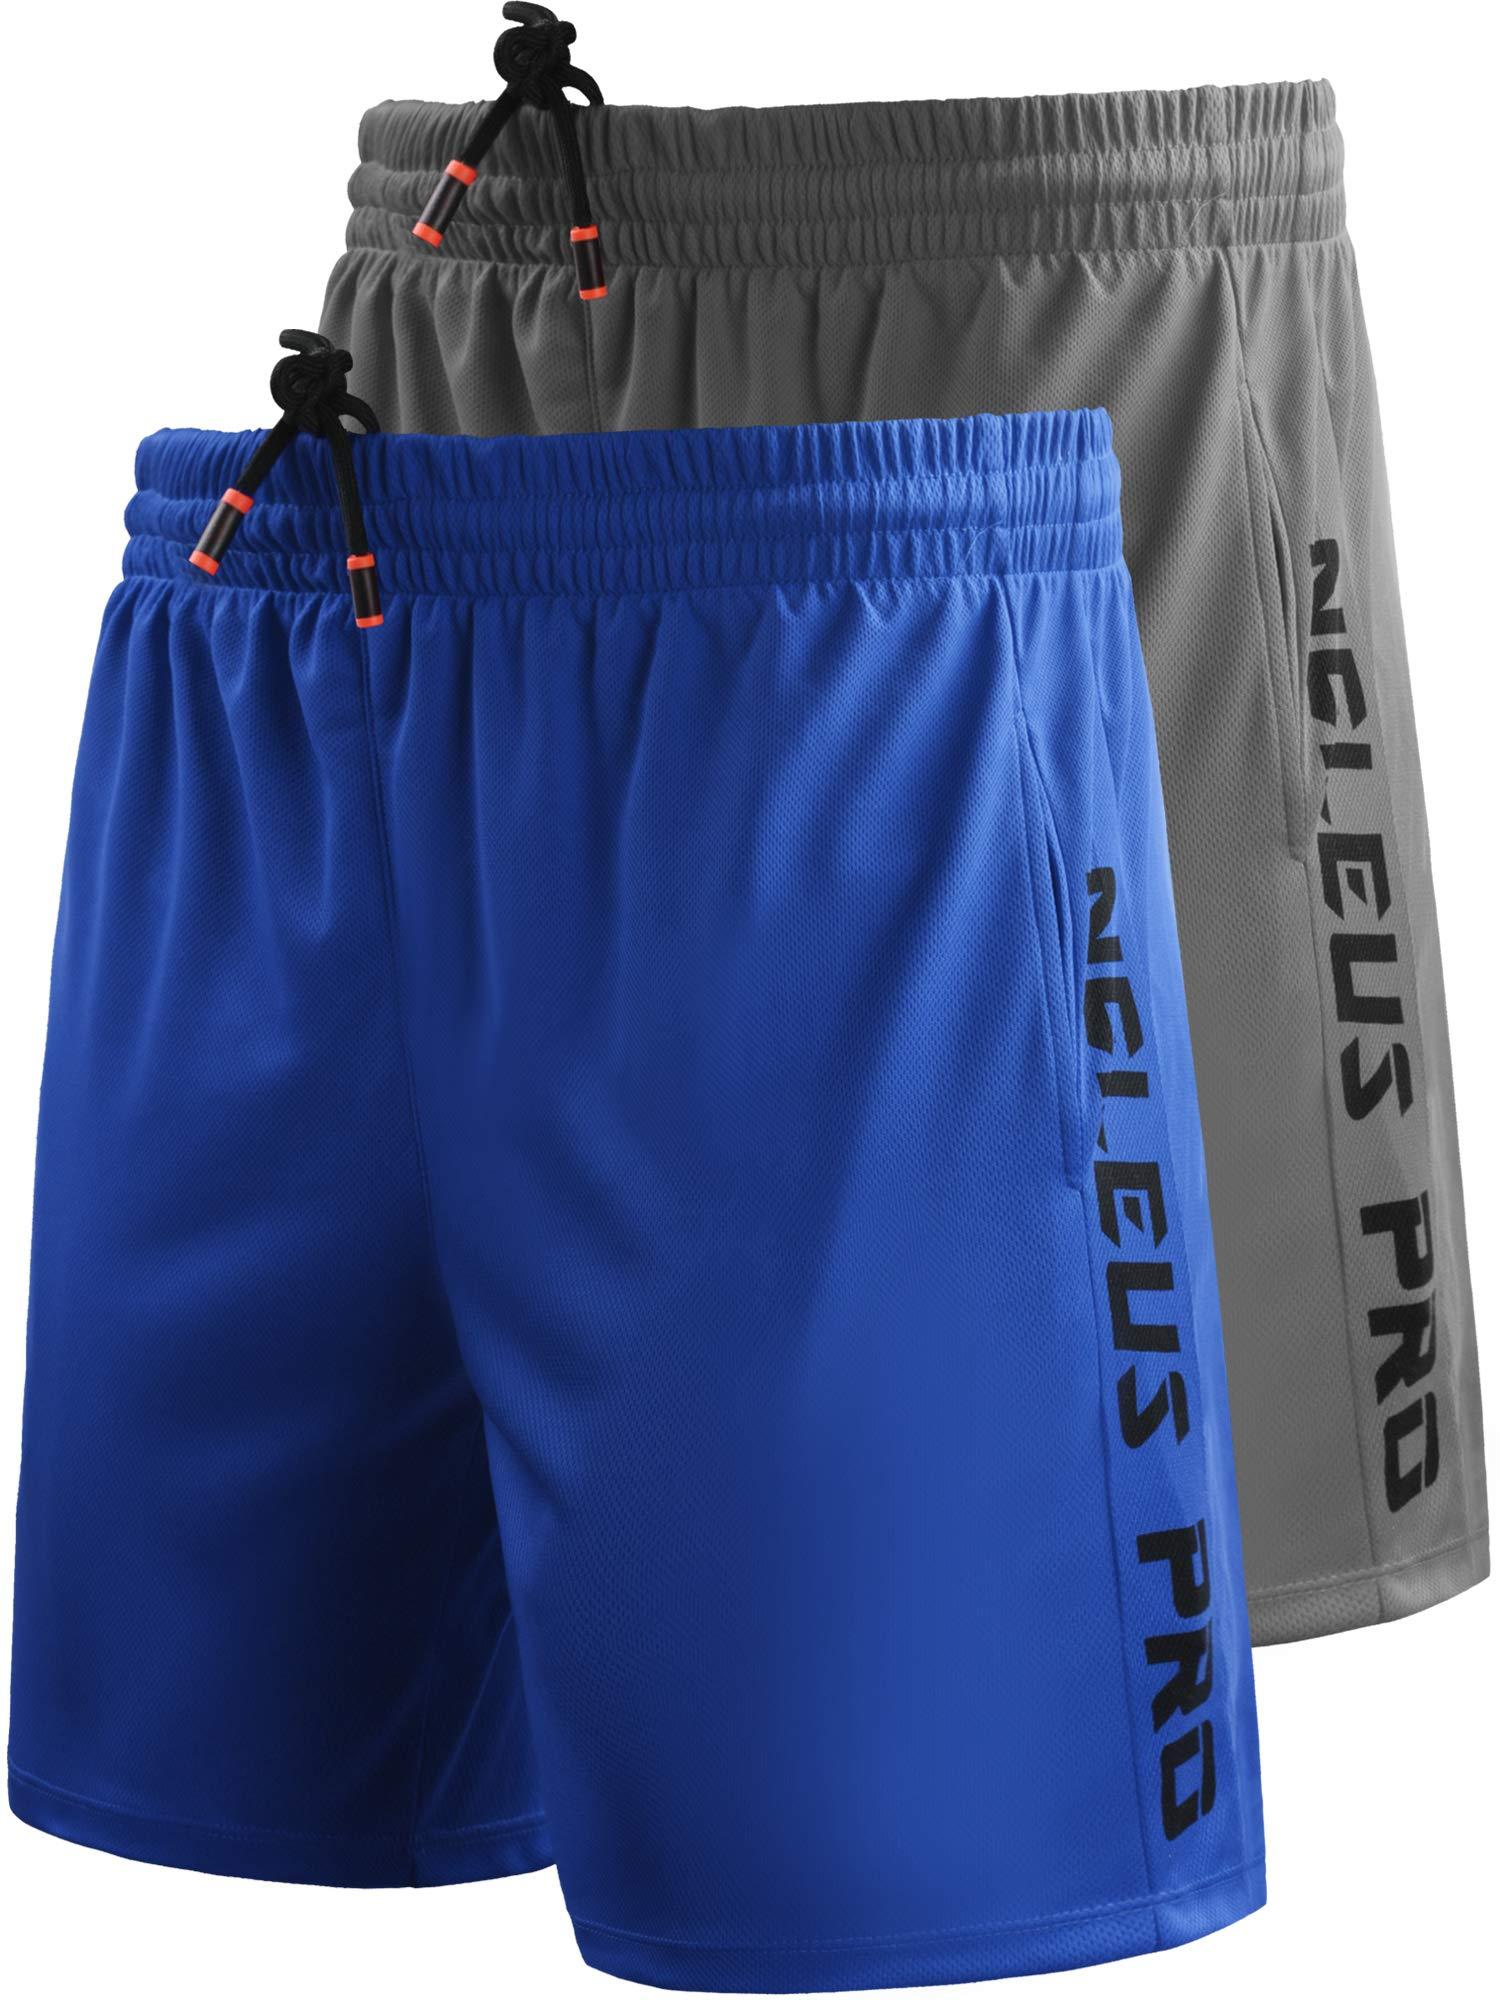 Neleus Men's 7'' Workout Running Shorts with Pockets,6056,2 Pack,Blue,Grey,US L,EU XL by Neleus